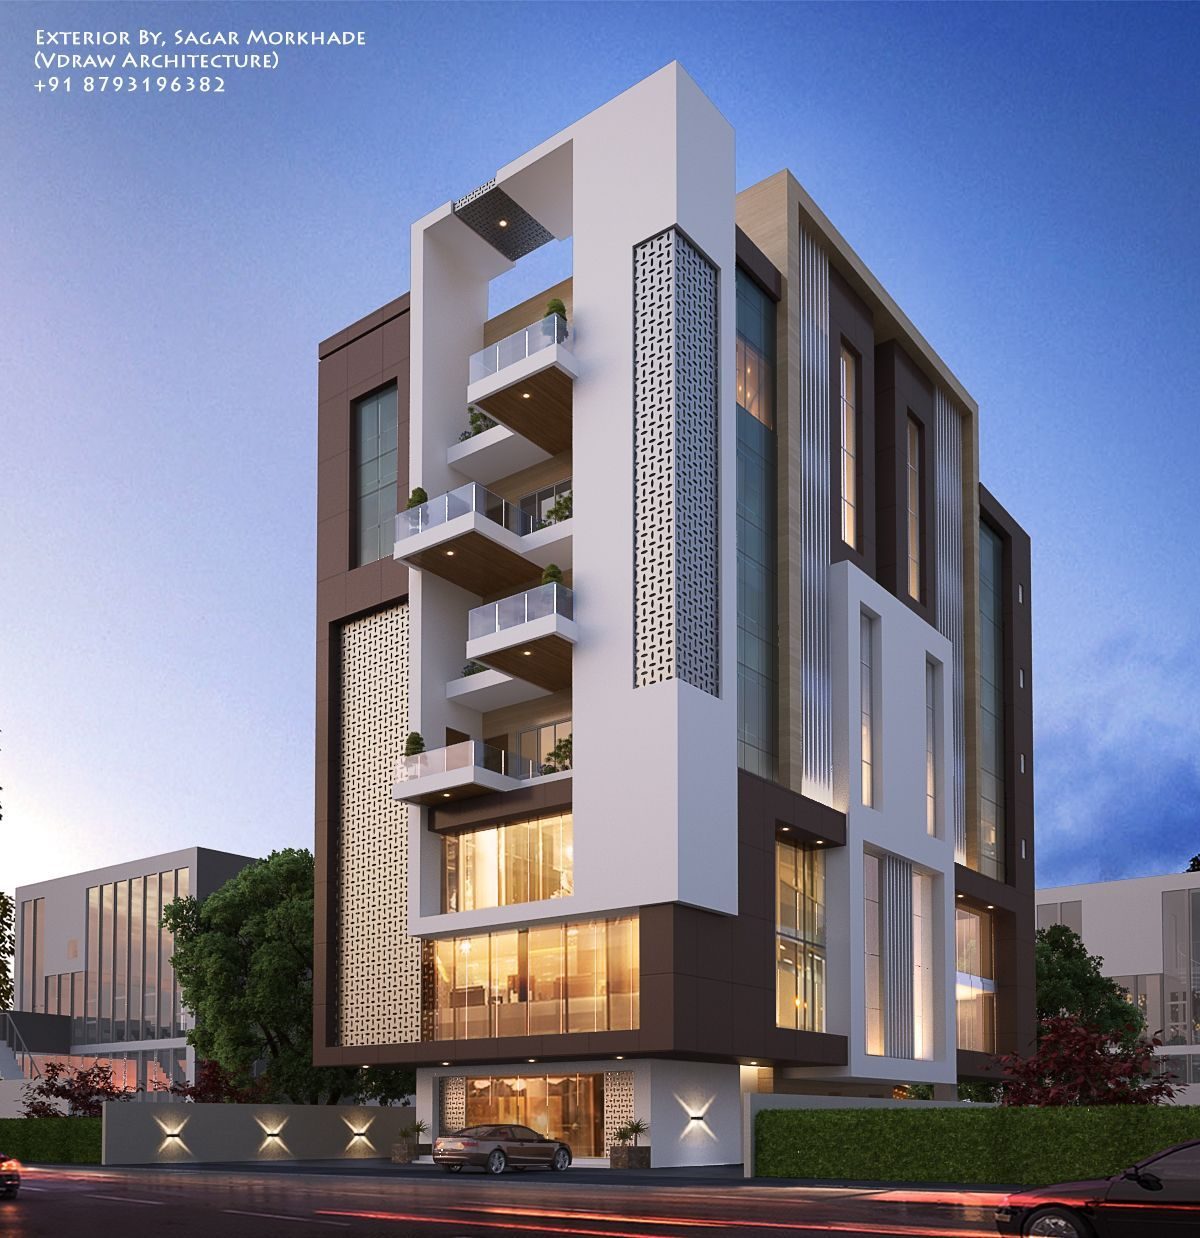 Exterior By Sagar Morkhade Vdraw Architecture 91 8793196382